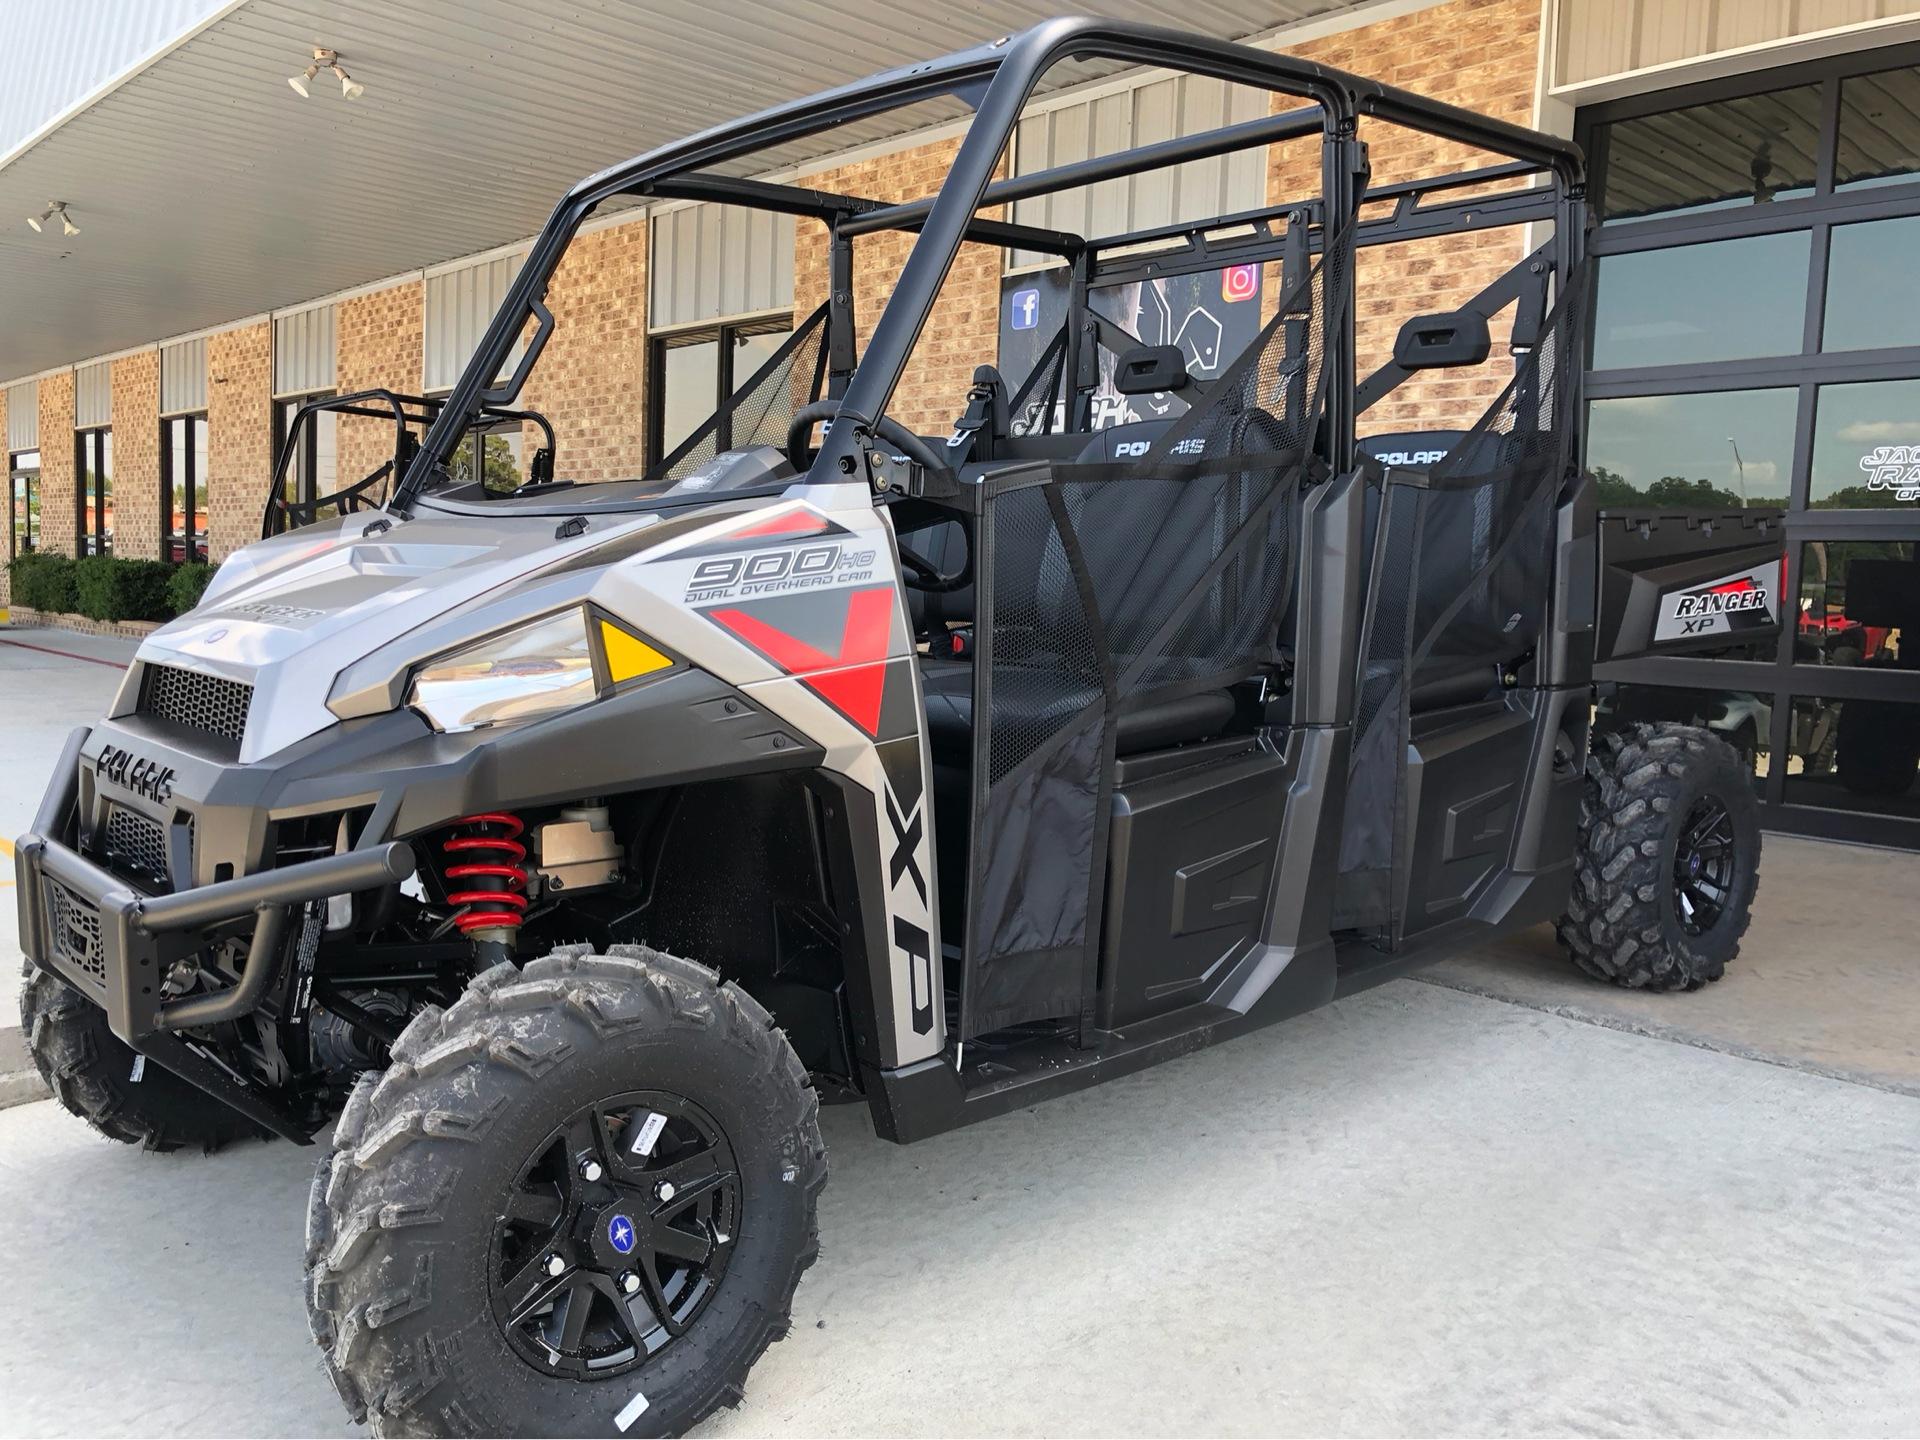 2019 Polaris Ranger Crew Xp 900 Eps In Marshall Texas